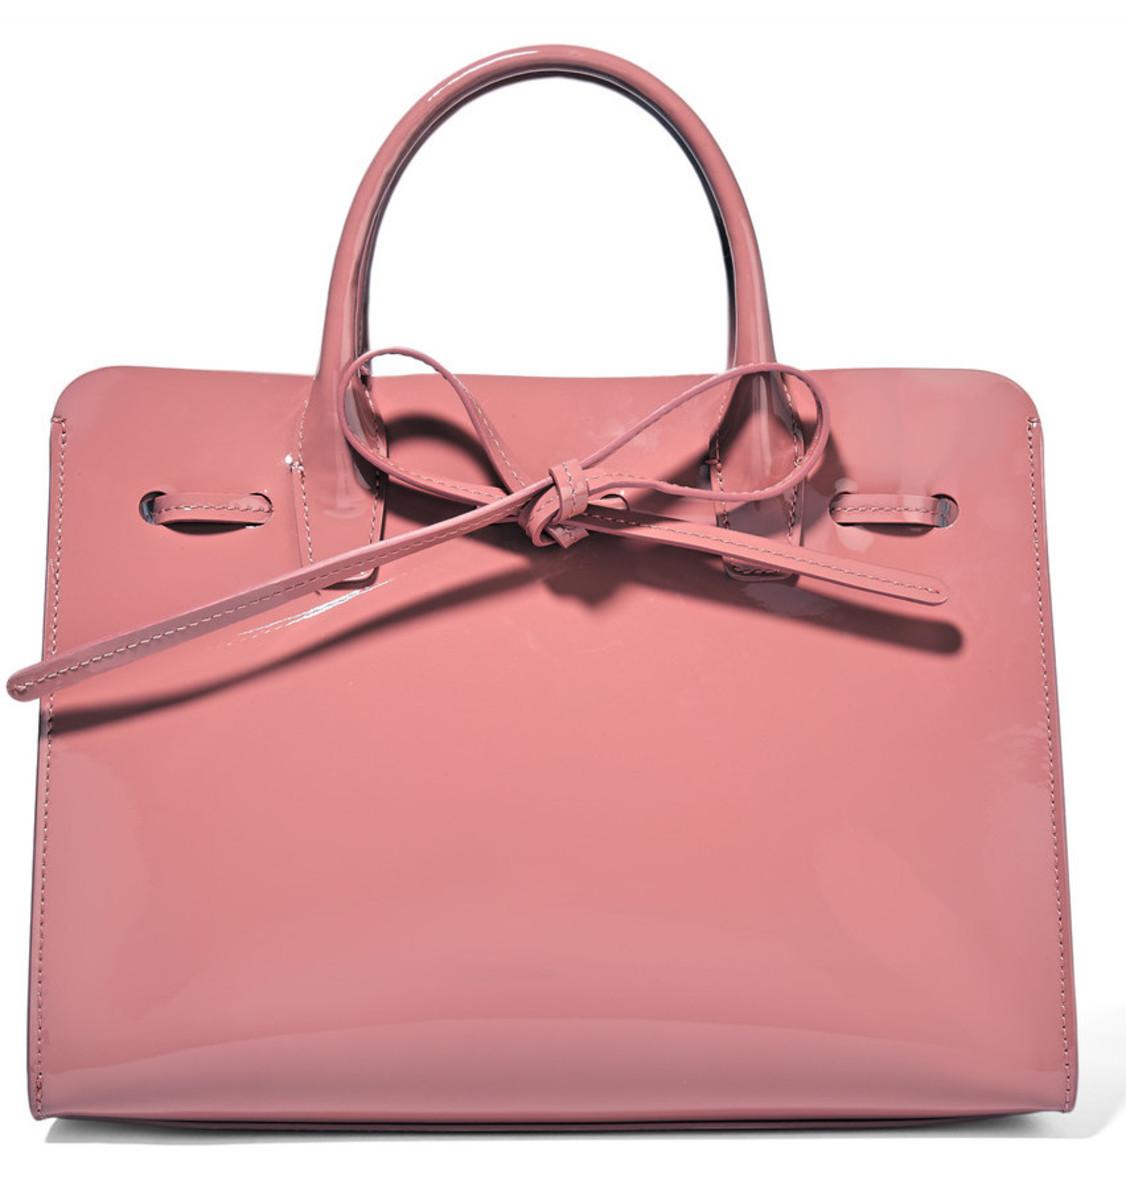 Mansur Gavriel sun mini patent leather tote, $595, available at Net-a-Porter.